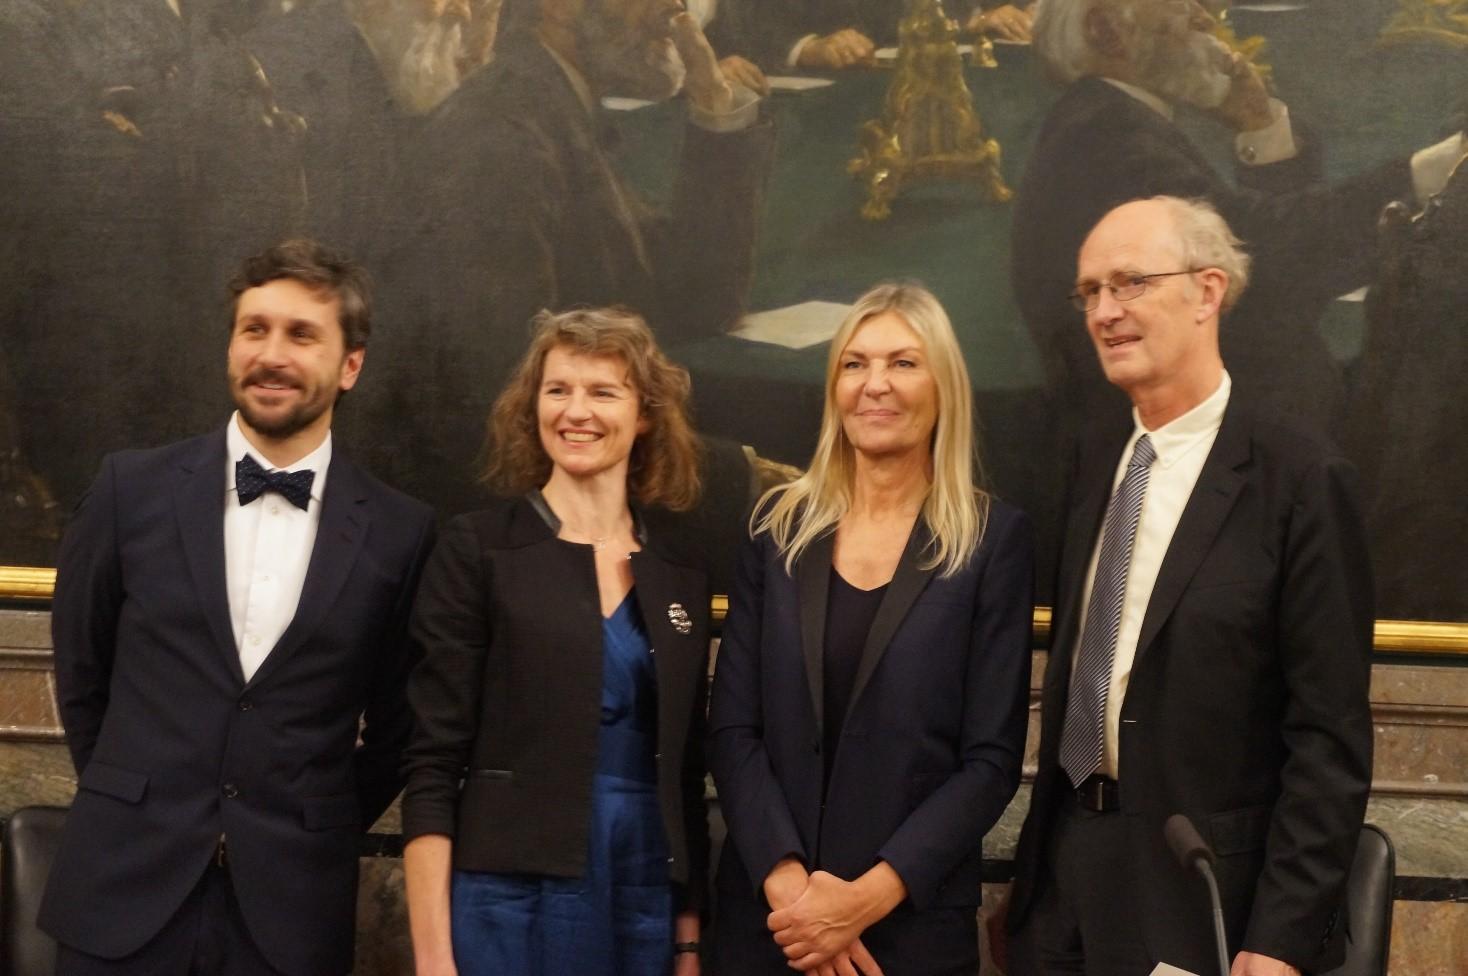 De fire prismodtagere. Fra venstre: Docent og universitetslektor Nicolo Dell'Unto, Professor Mette Birkedal Bruun, Arkitekt Dorte Mandrup og Professor emeritus Troels Engberg-Pedersen.